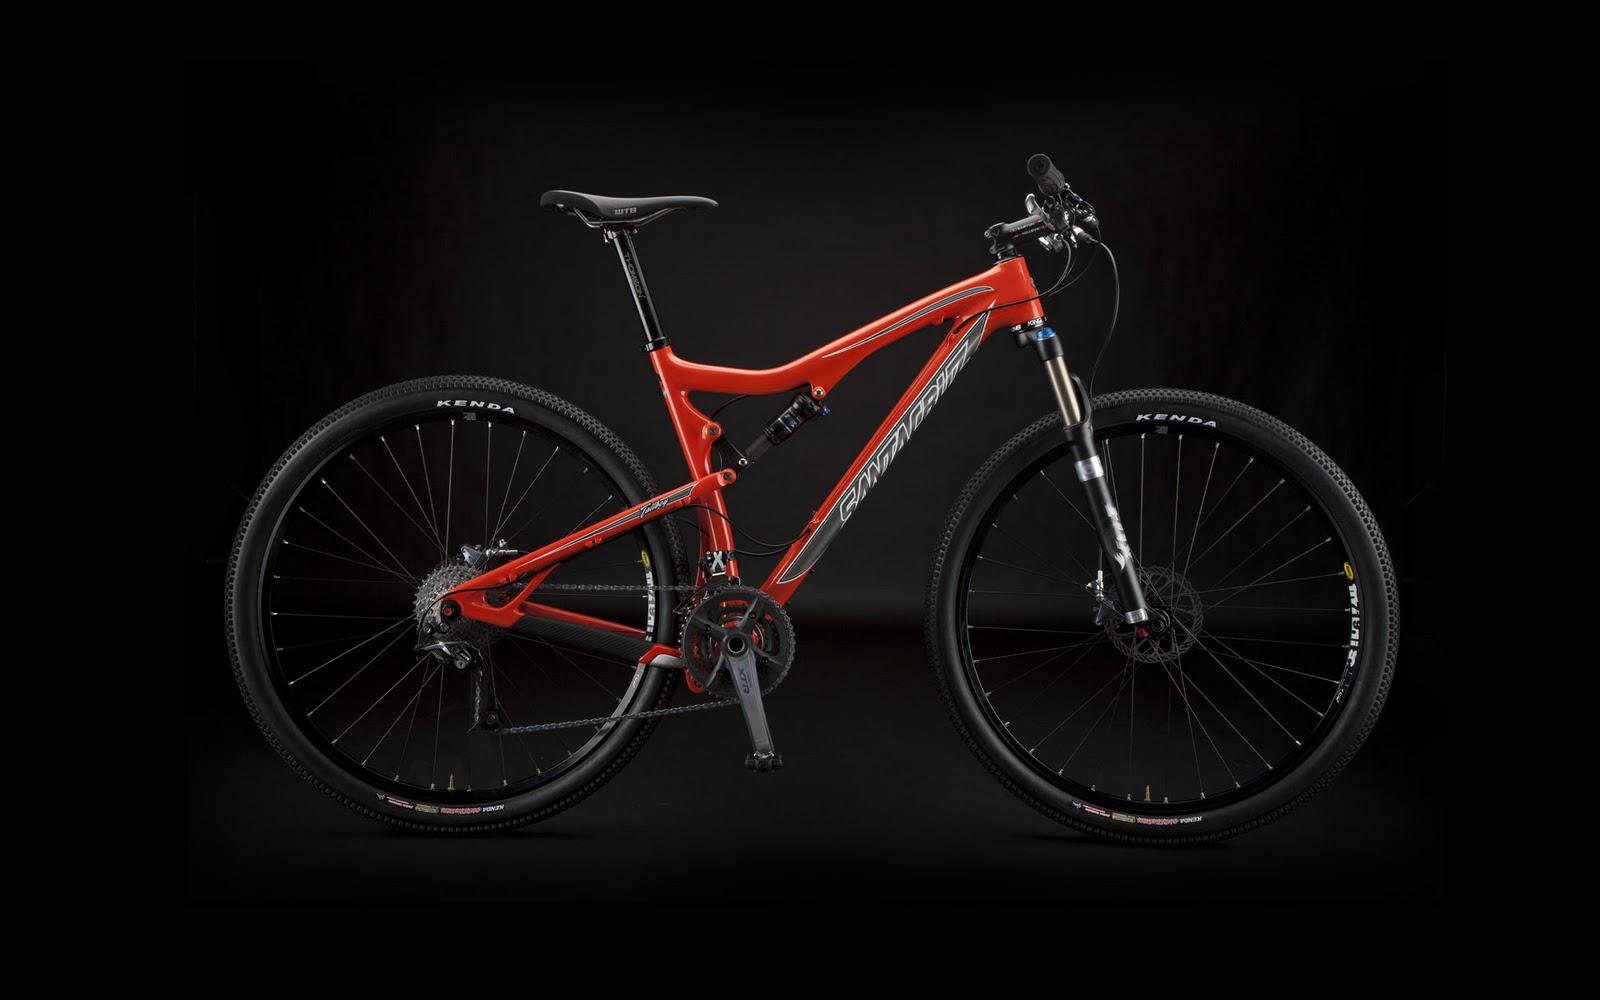 Ride My Bicycle Santa Cruz Tall Boy Carbon Xtr Xc 29